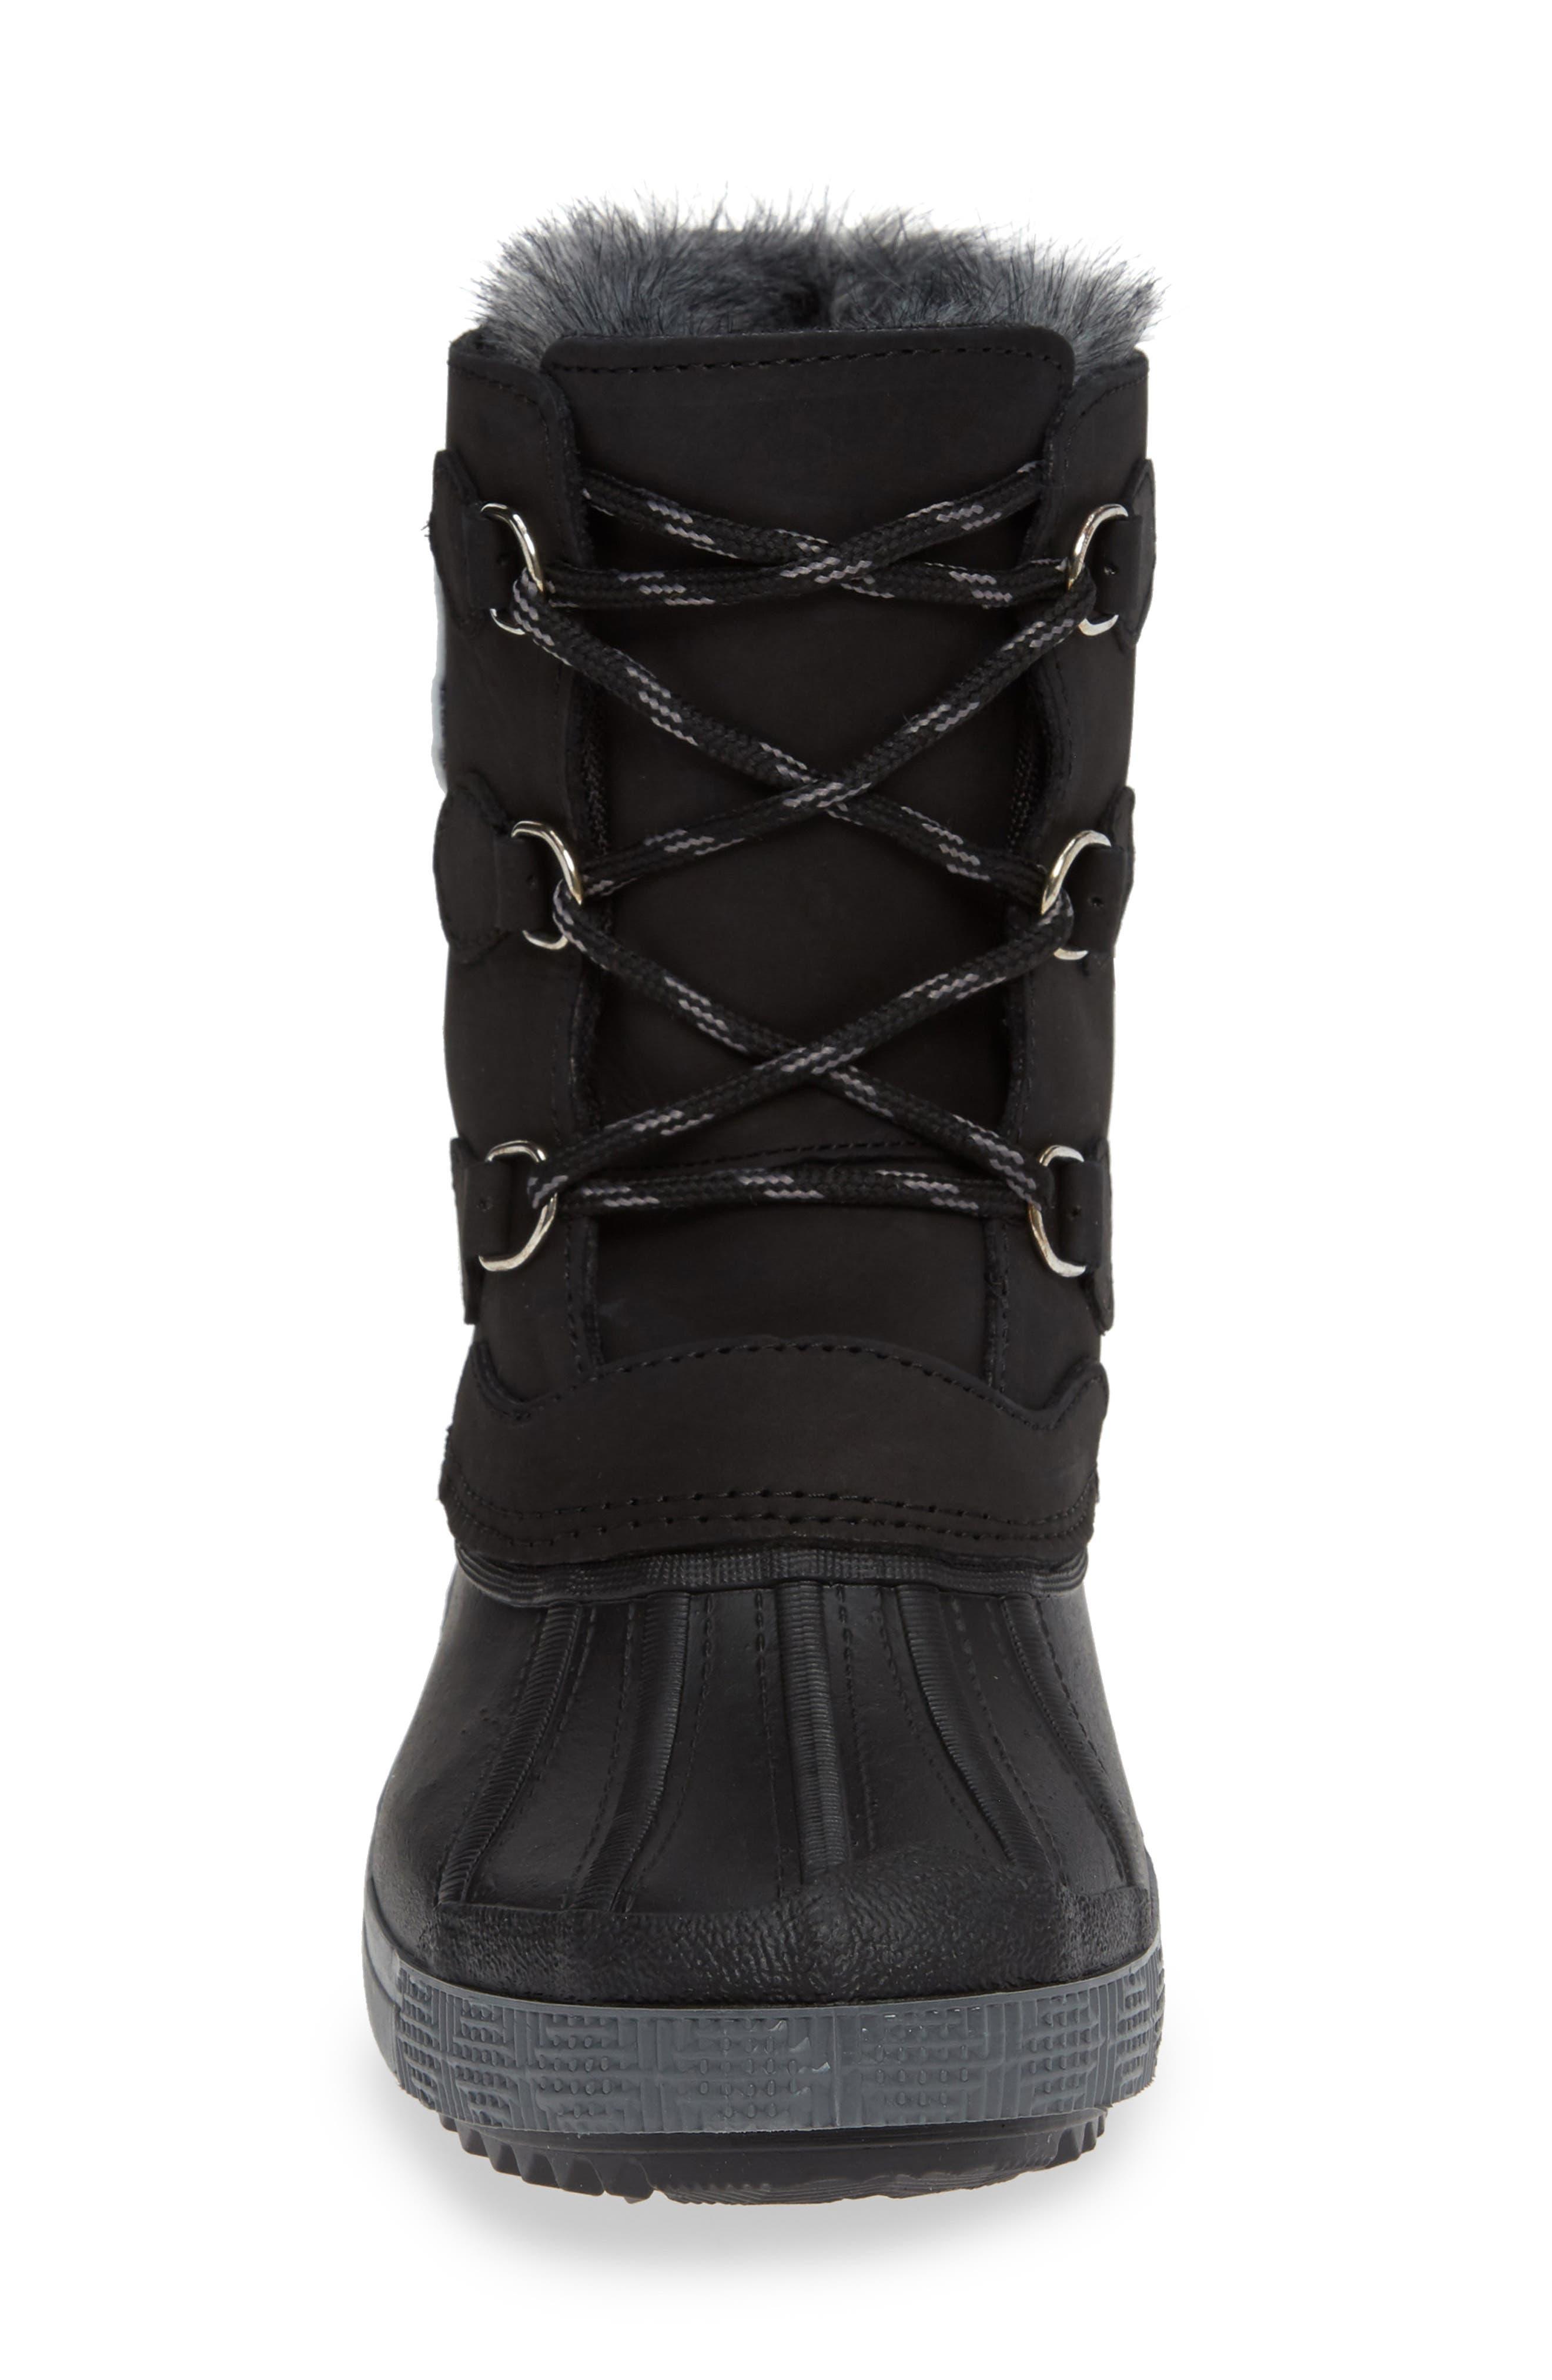 Cali Waterproof Insulated Boot,                             Alternate thumbnail 4, color,                             BROWN/ BLACK